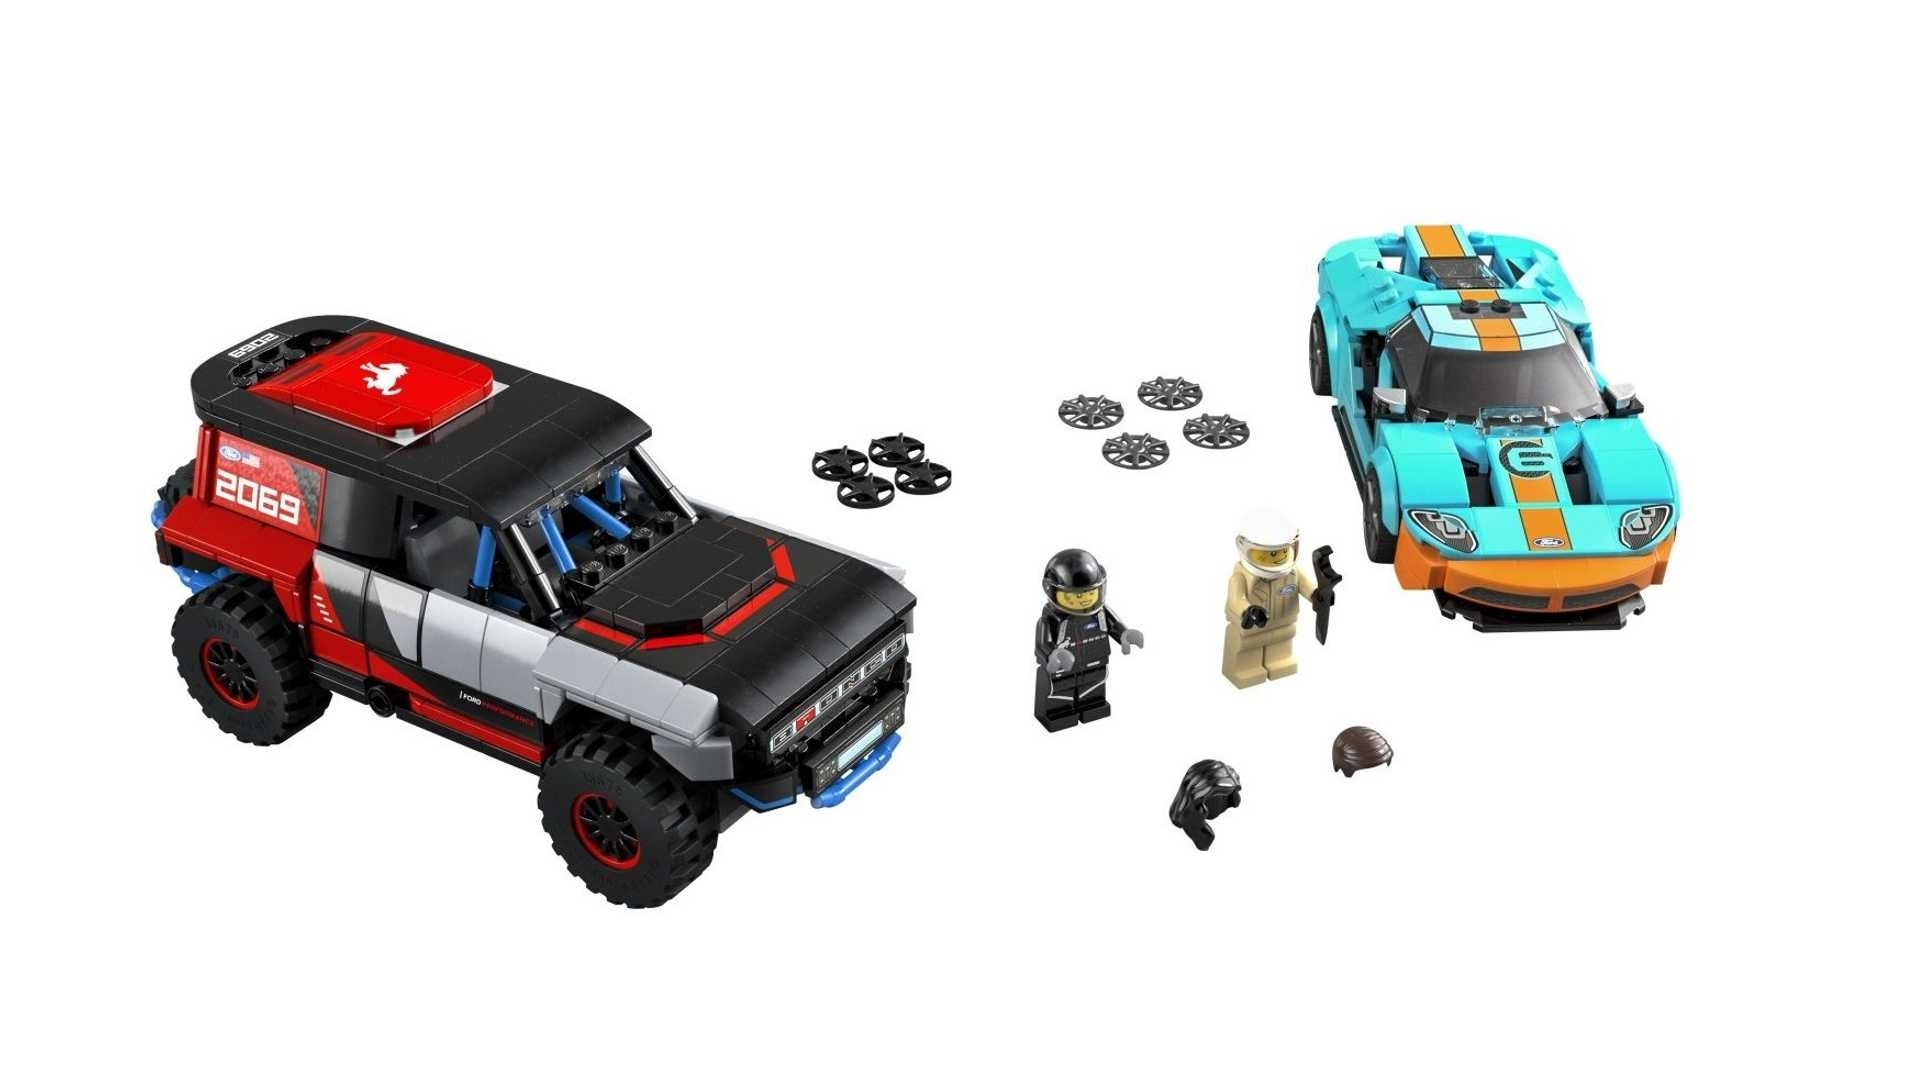 Lego Speed Champions Novedades 2021 0521 005